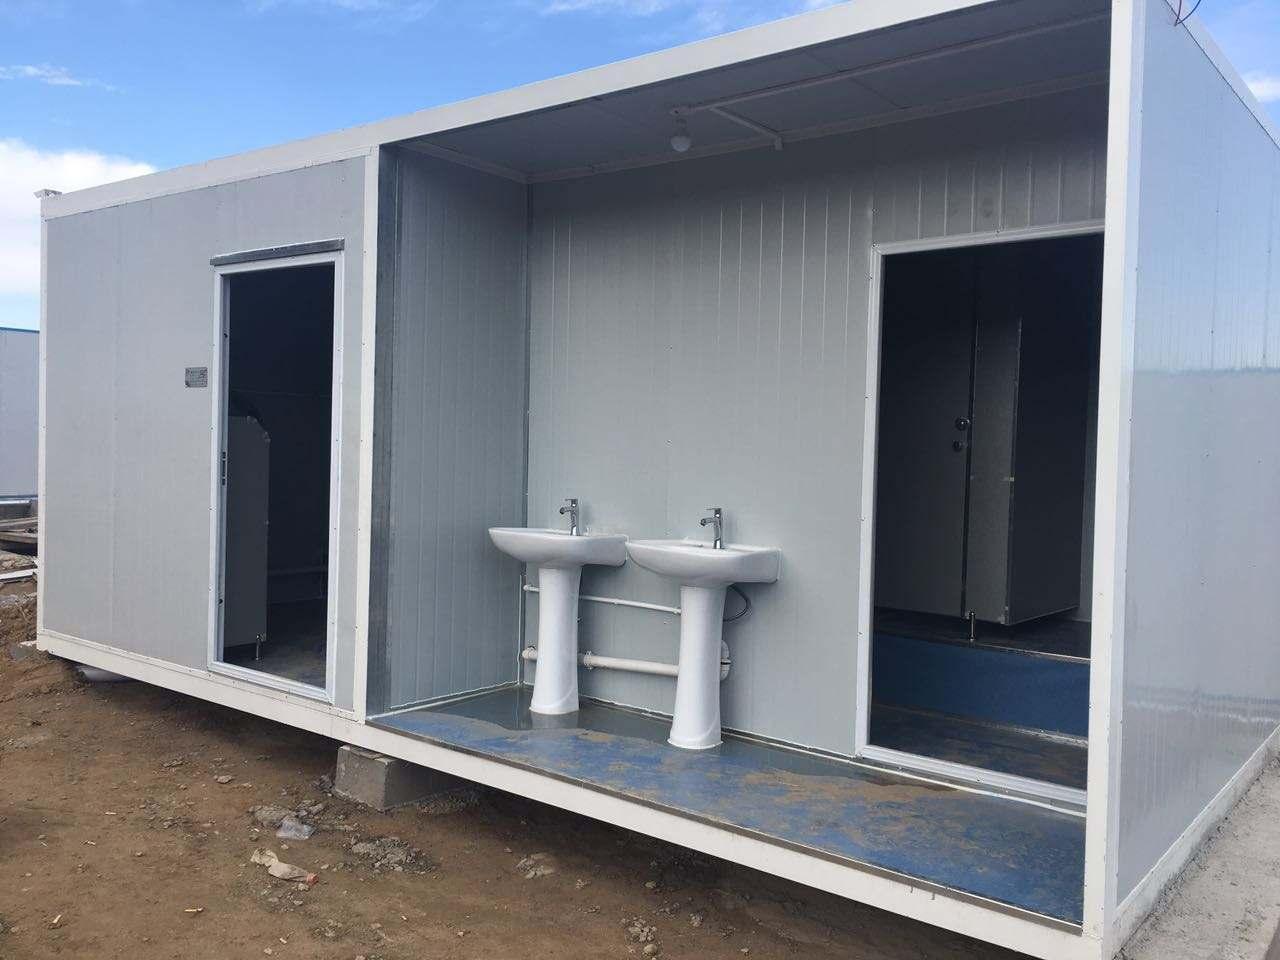 <b>廊坊市集装箱卫生间</b>